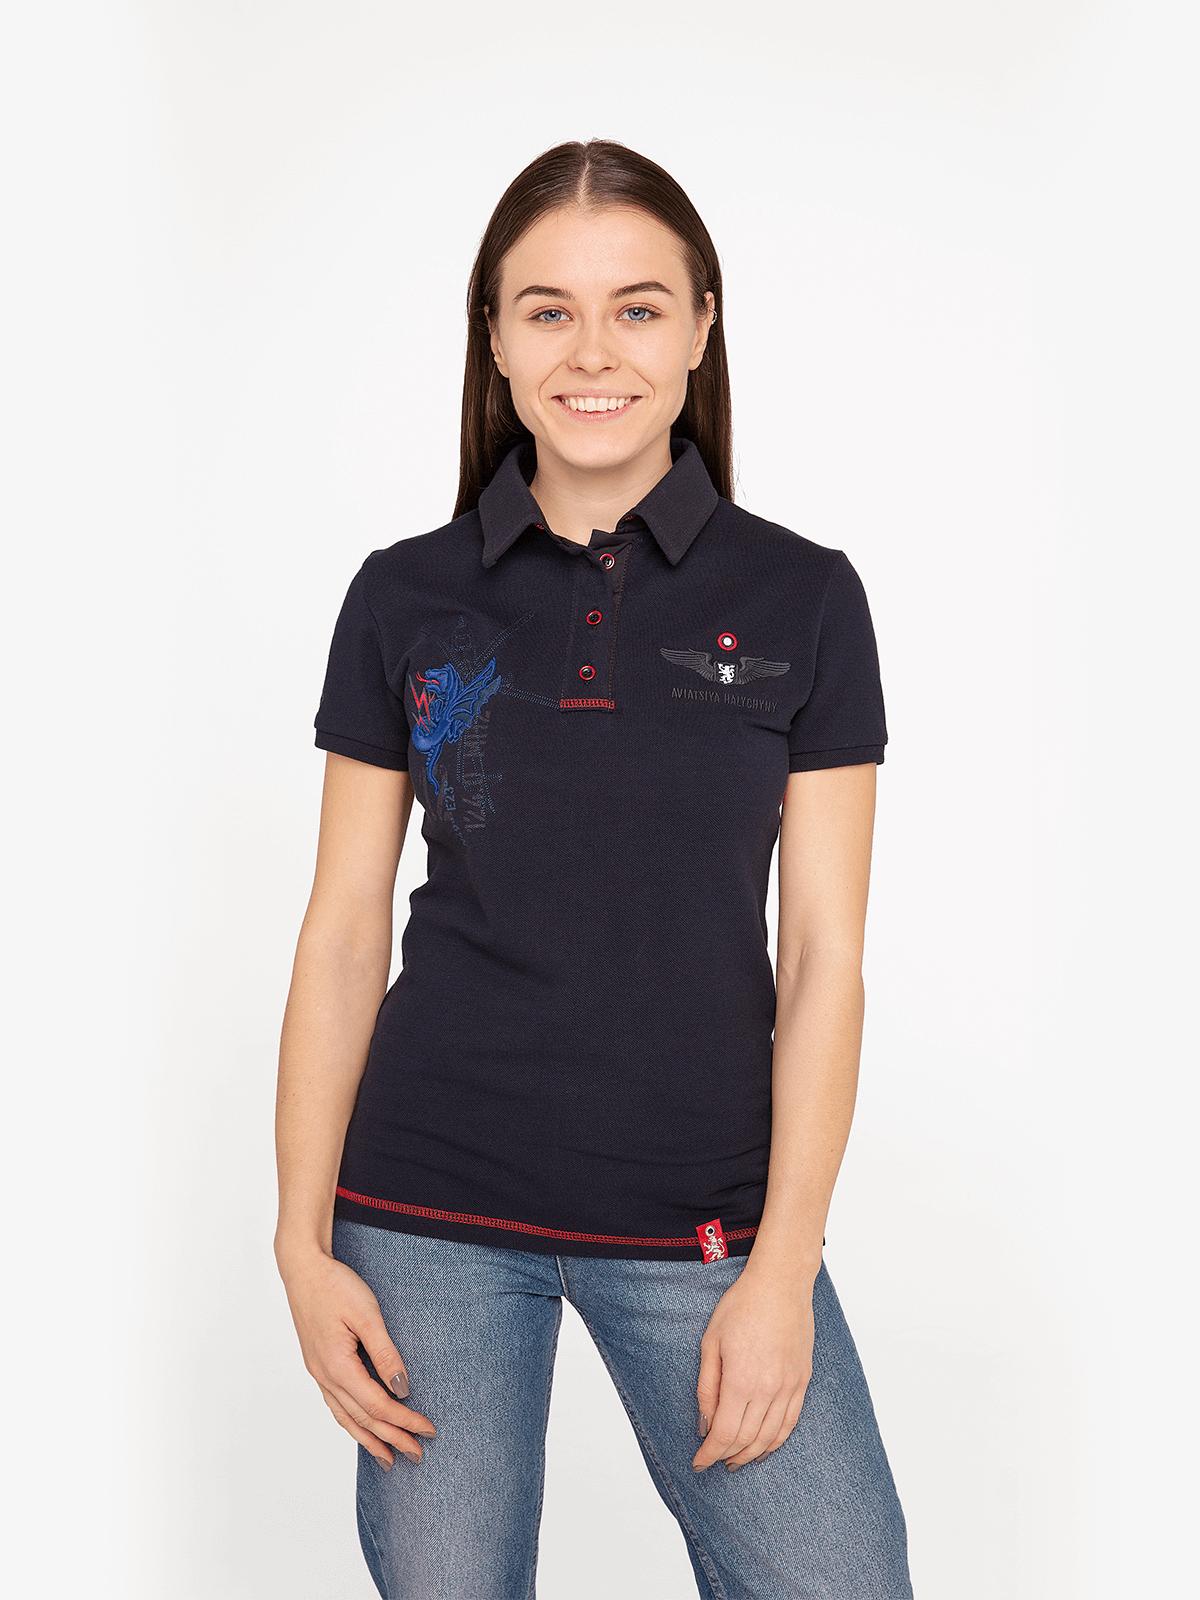 Women's Polo Shirt 12 Brigade (Kalyniv). Color dark blue. Pique fabric: 100% cotton.